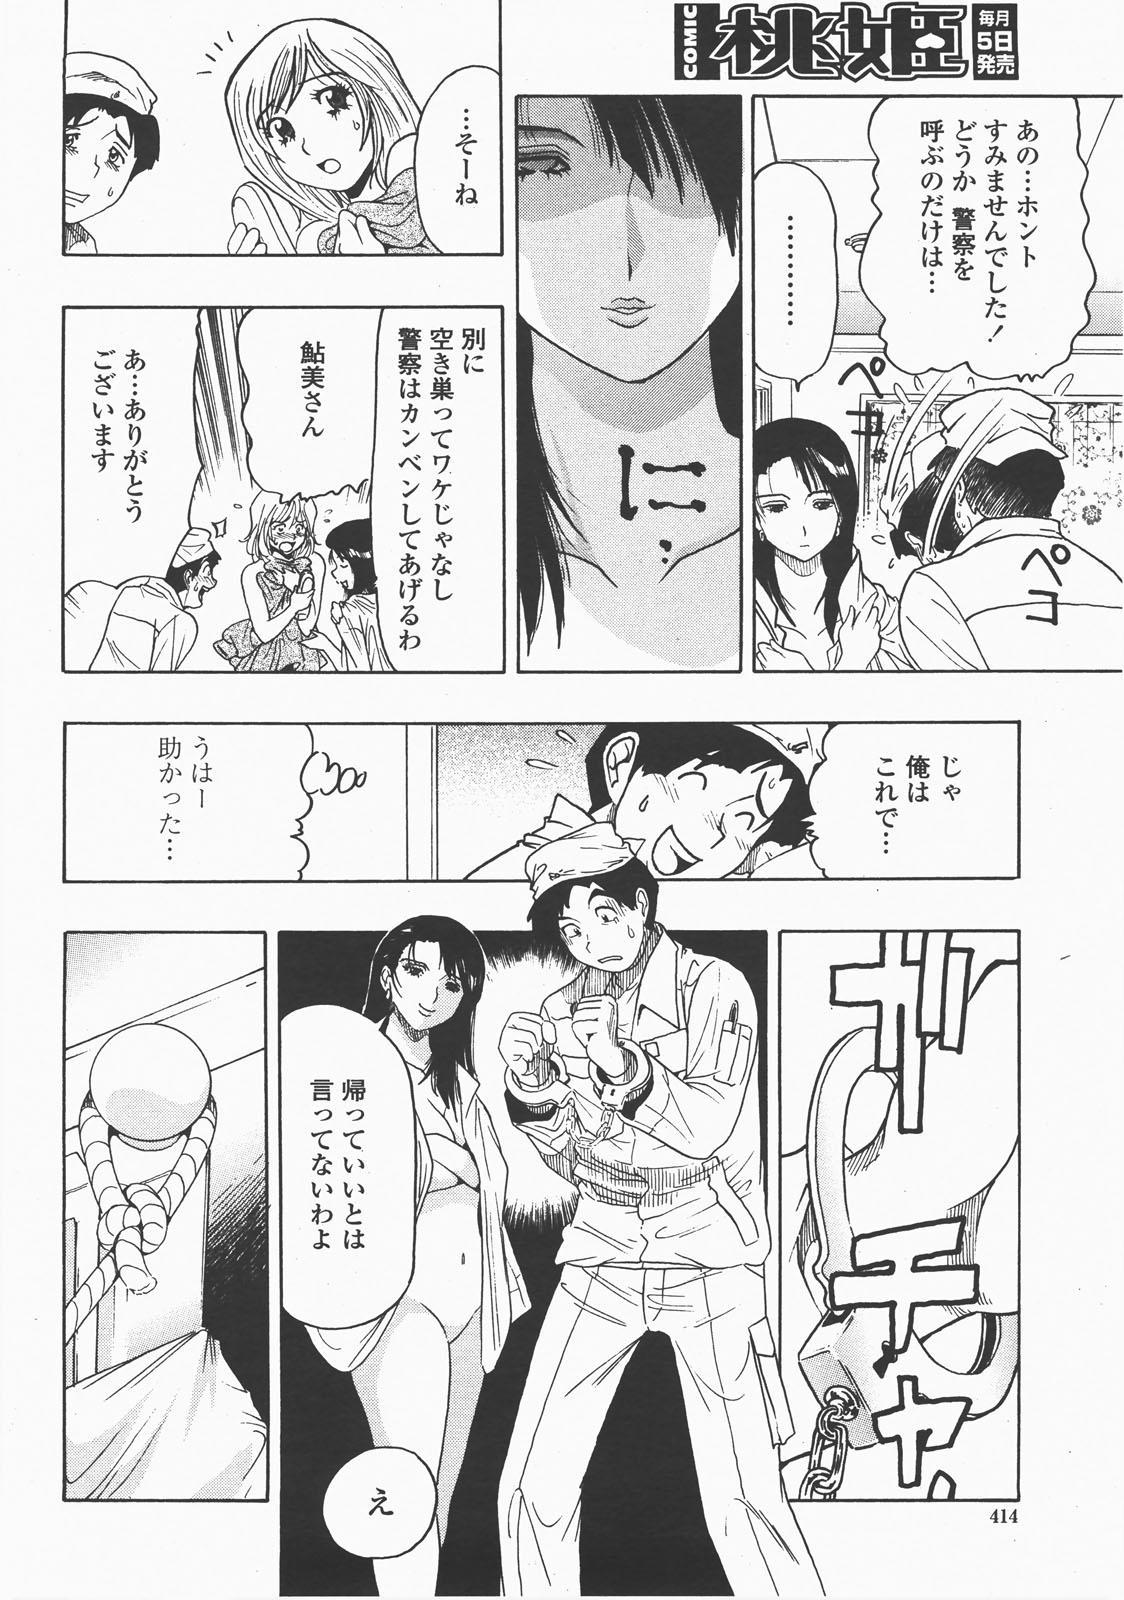 COMIC Momohime 2007-12 416